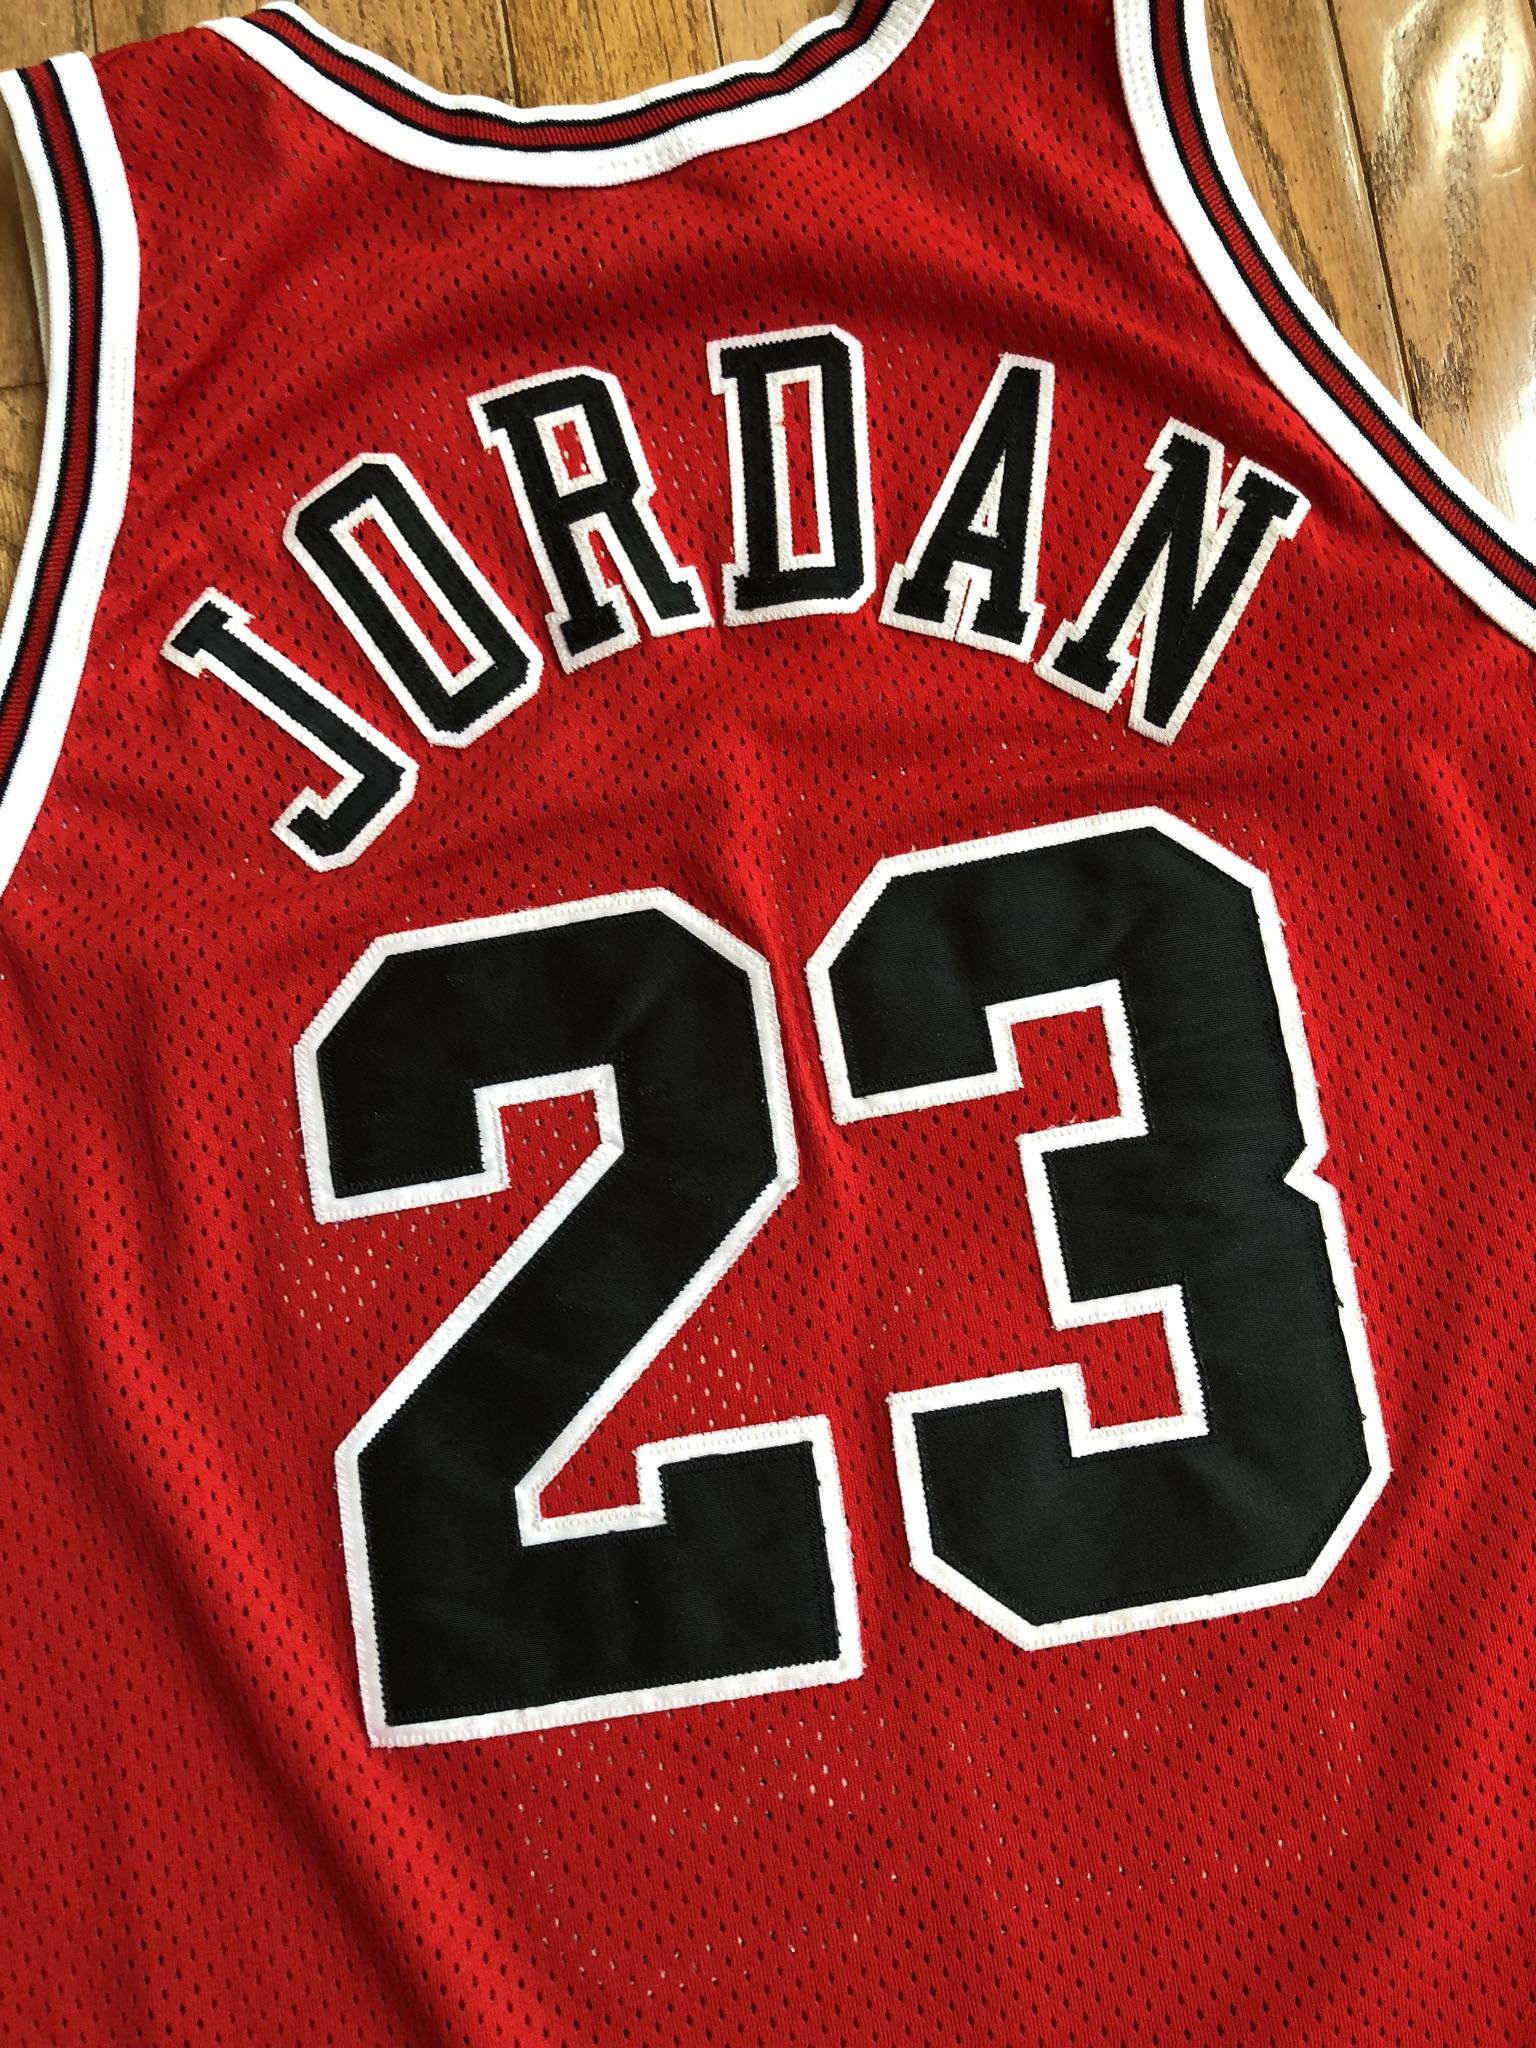 huge discount cbf1e 3114b 1996 Michael Jordan Chicago Bulls Authentic NBA Finals Champion NBA Jersey  Size 44